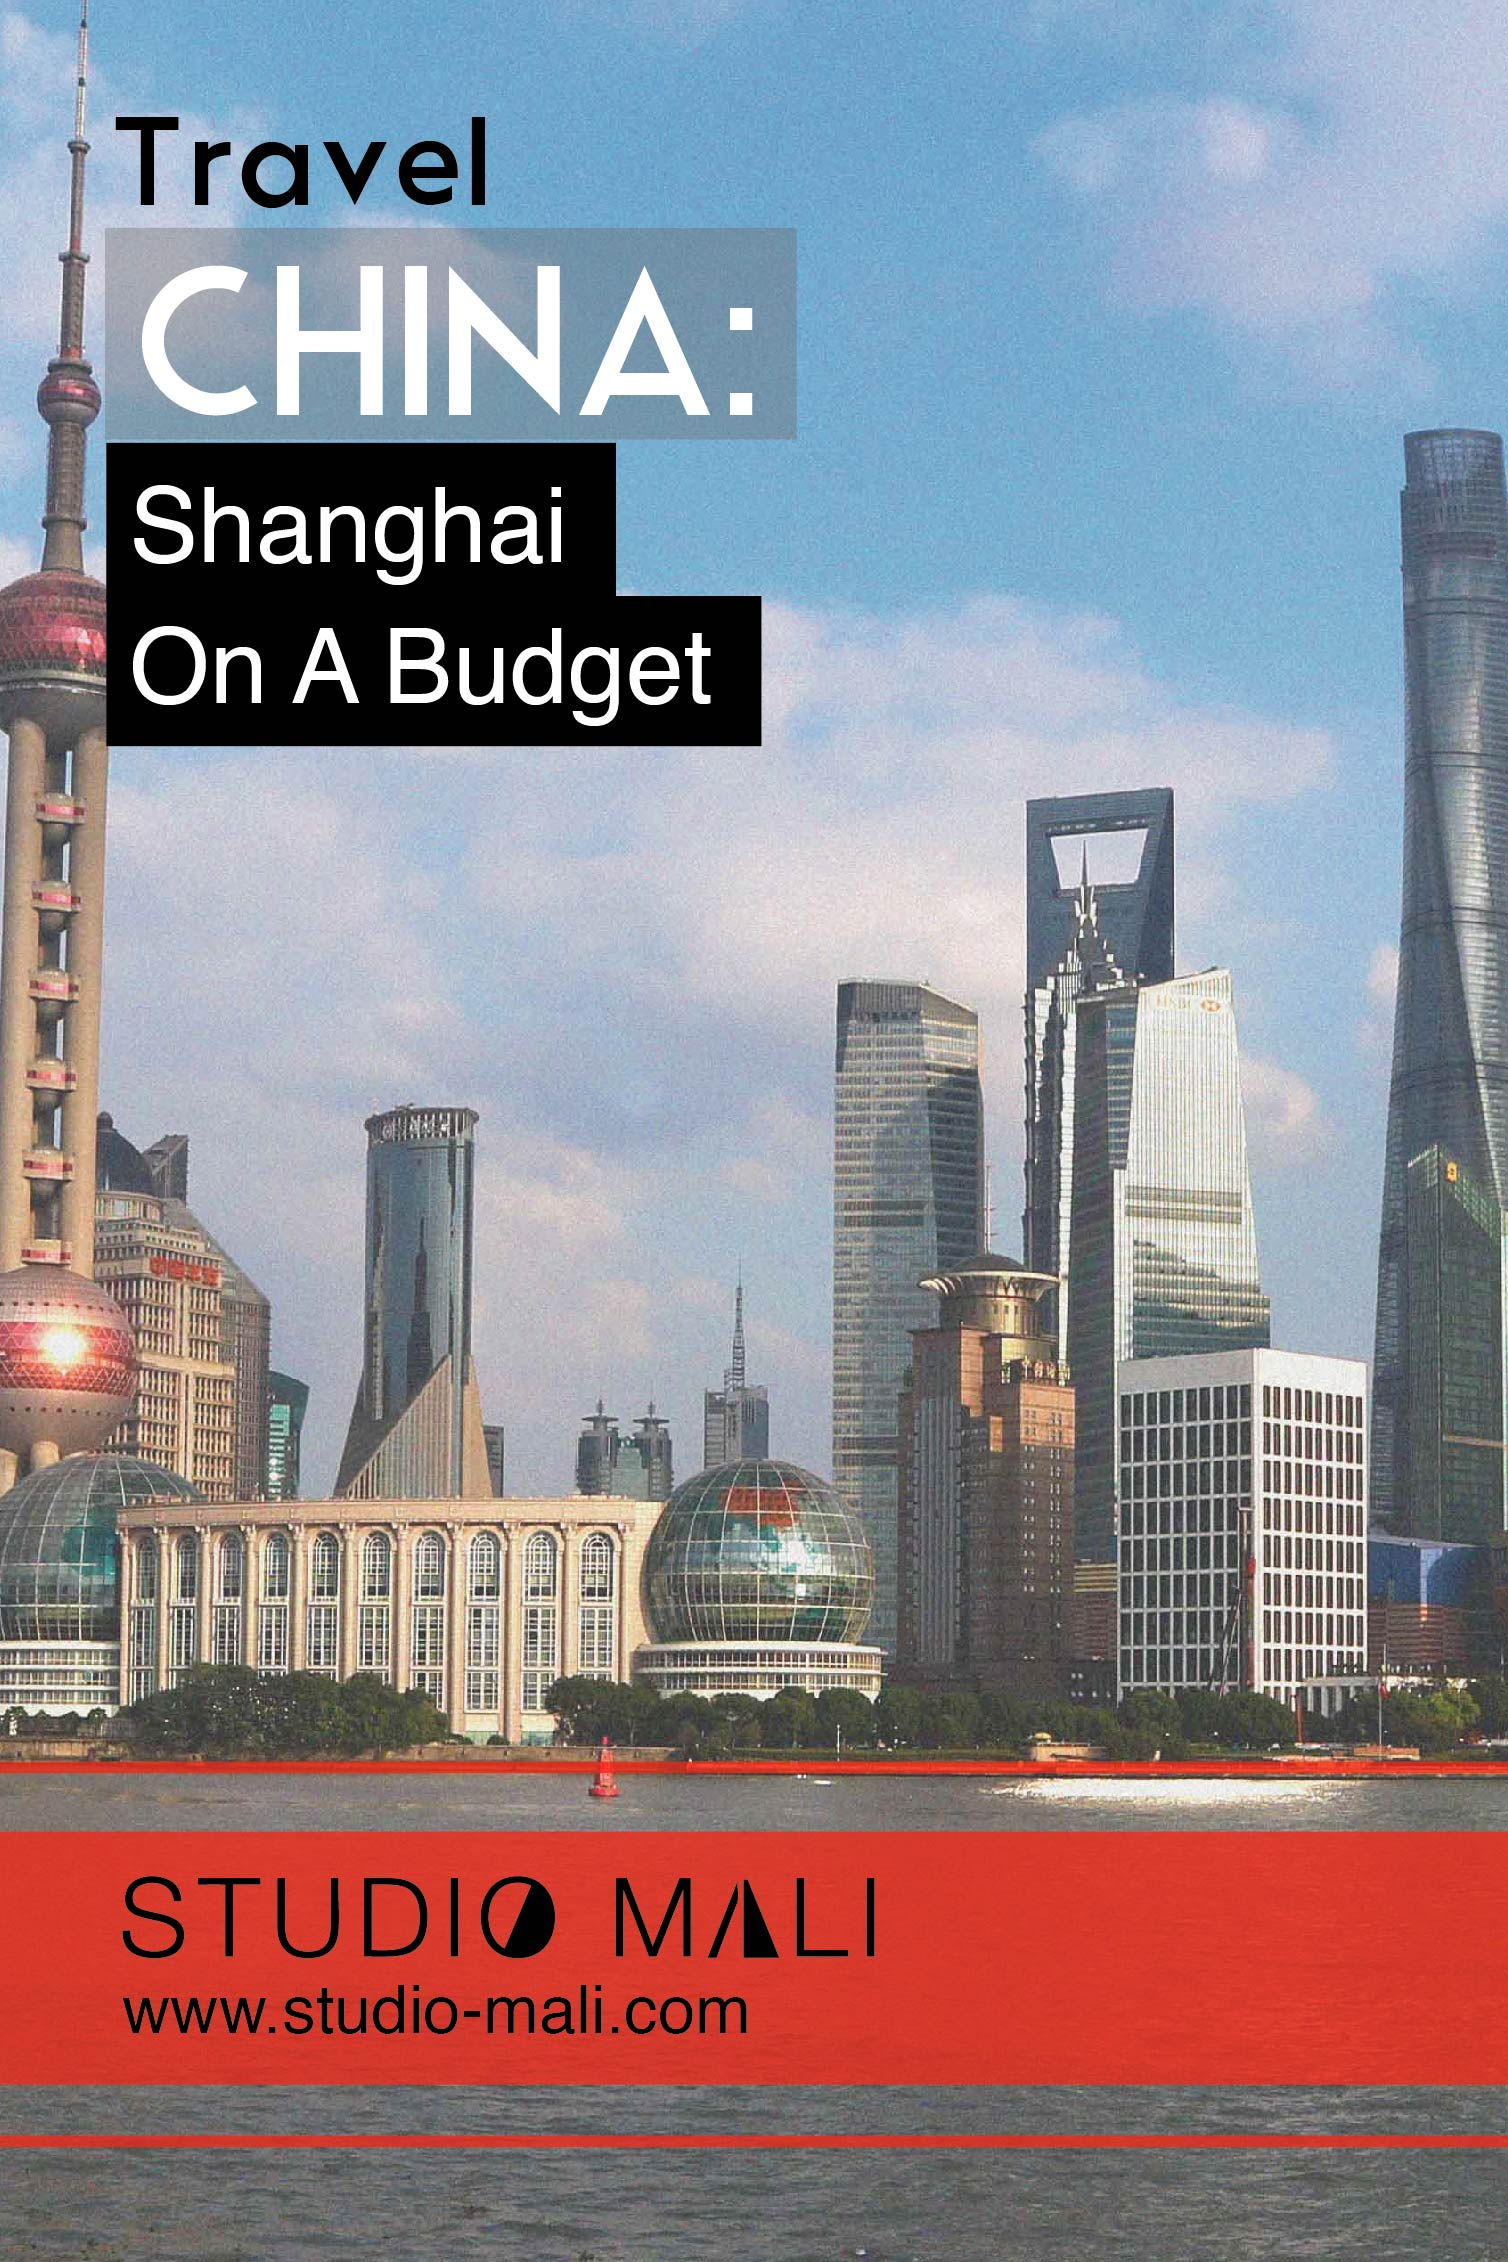 China - Shanghai On A Budget, by Studio Mali.jpg